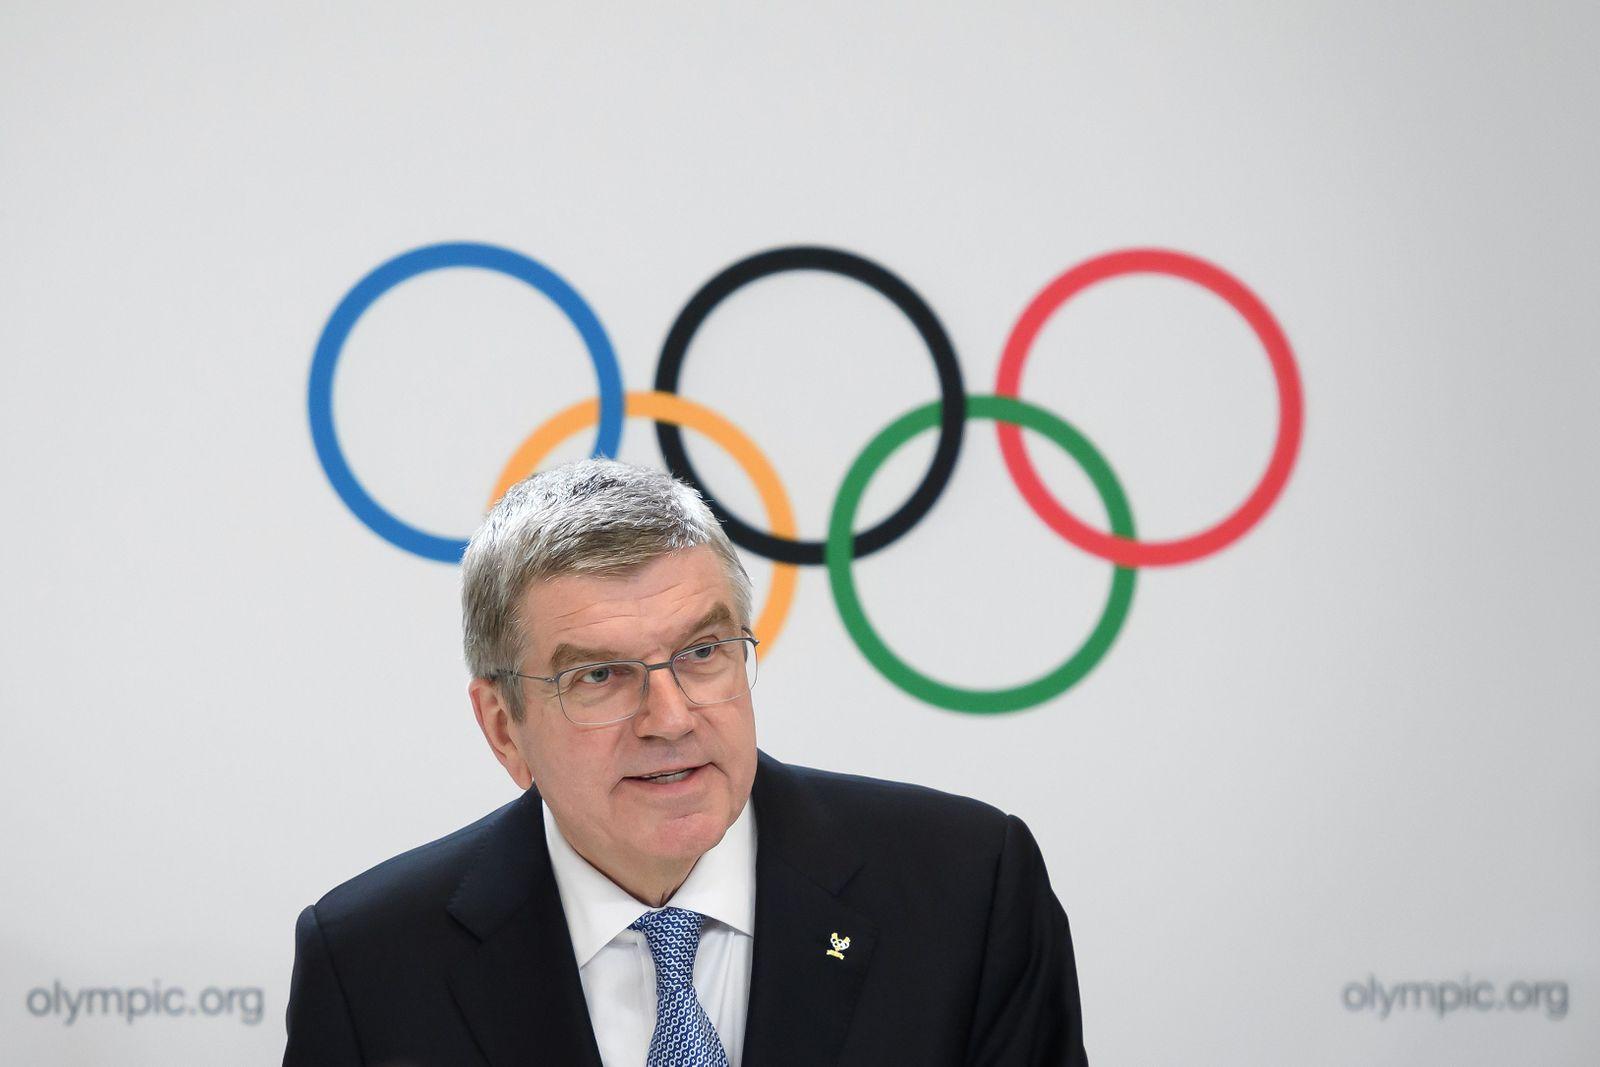 FILES-OLY-IOC-SPORTS-HEALTH-VIRUS